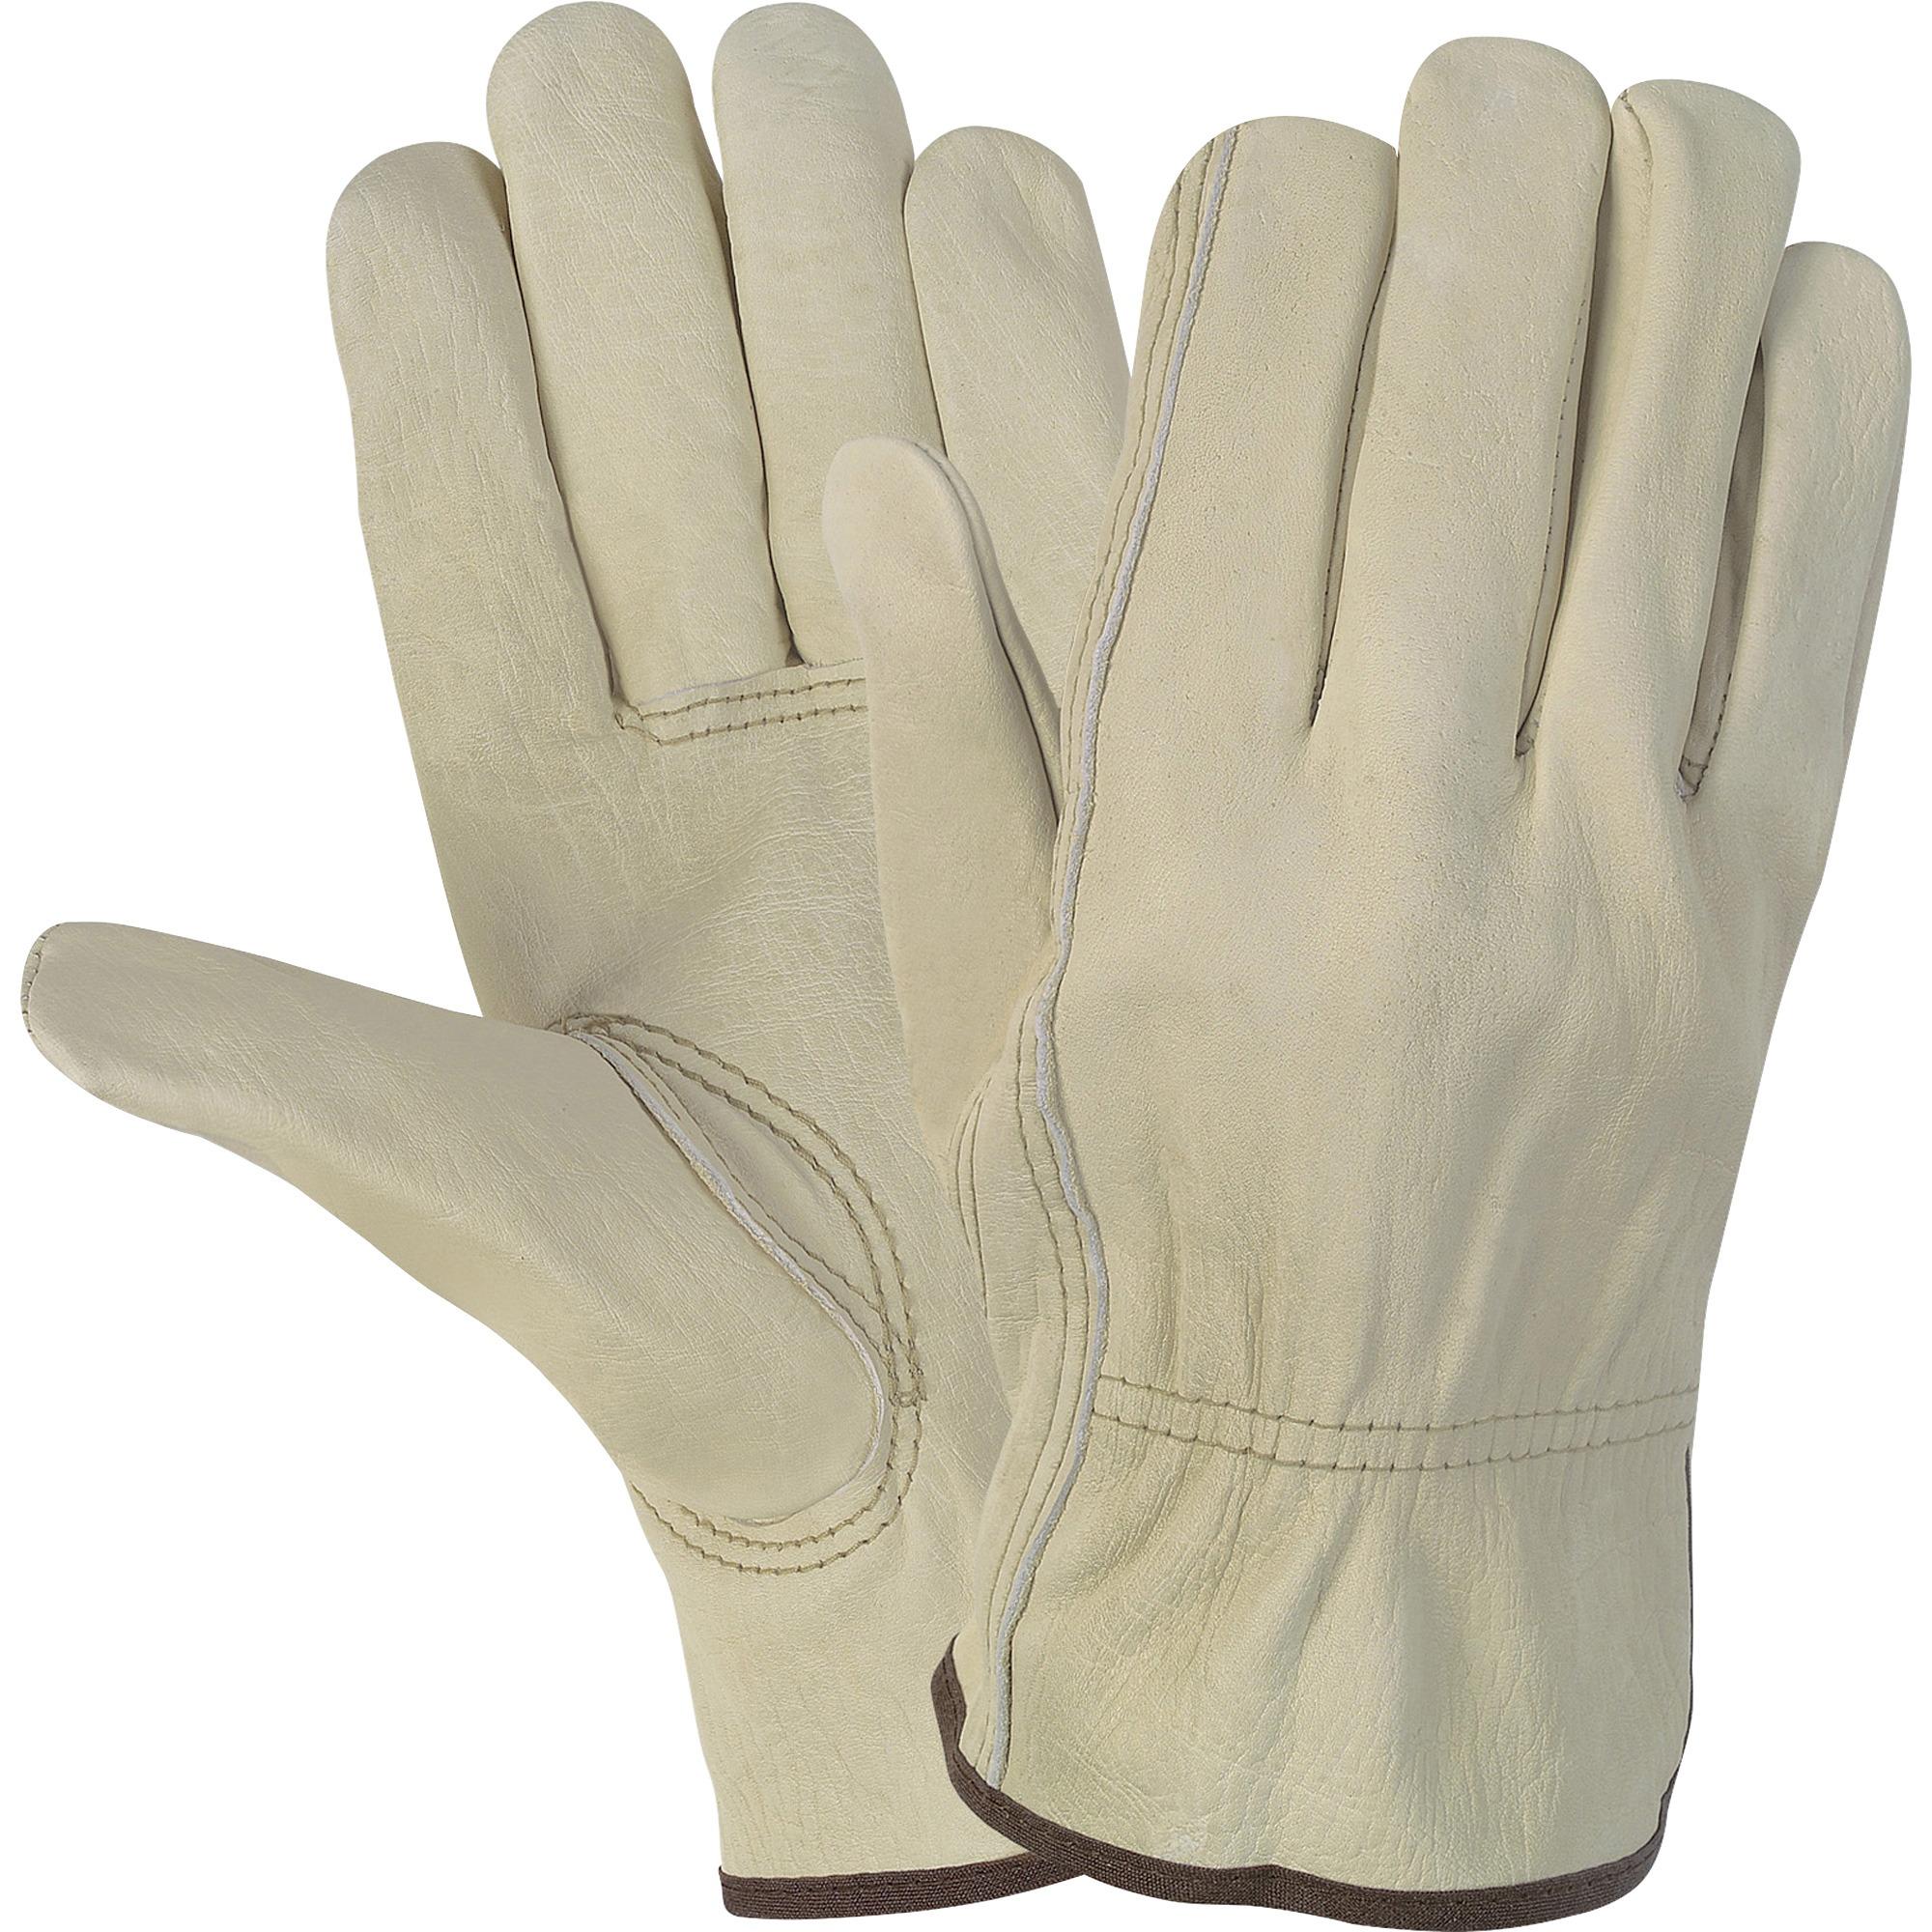 MCR Safety, MCSCRW3215L, Durable Cowhide Leather Work Gloves, 1 Pair, Cream, L